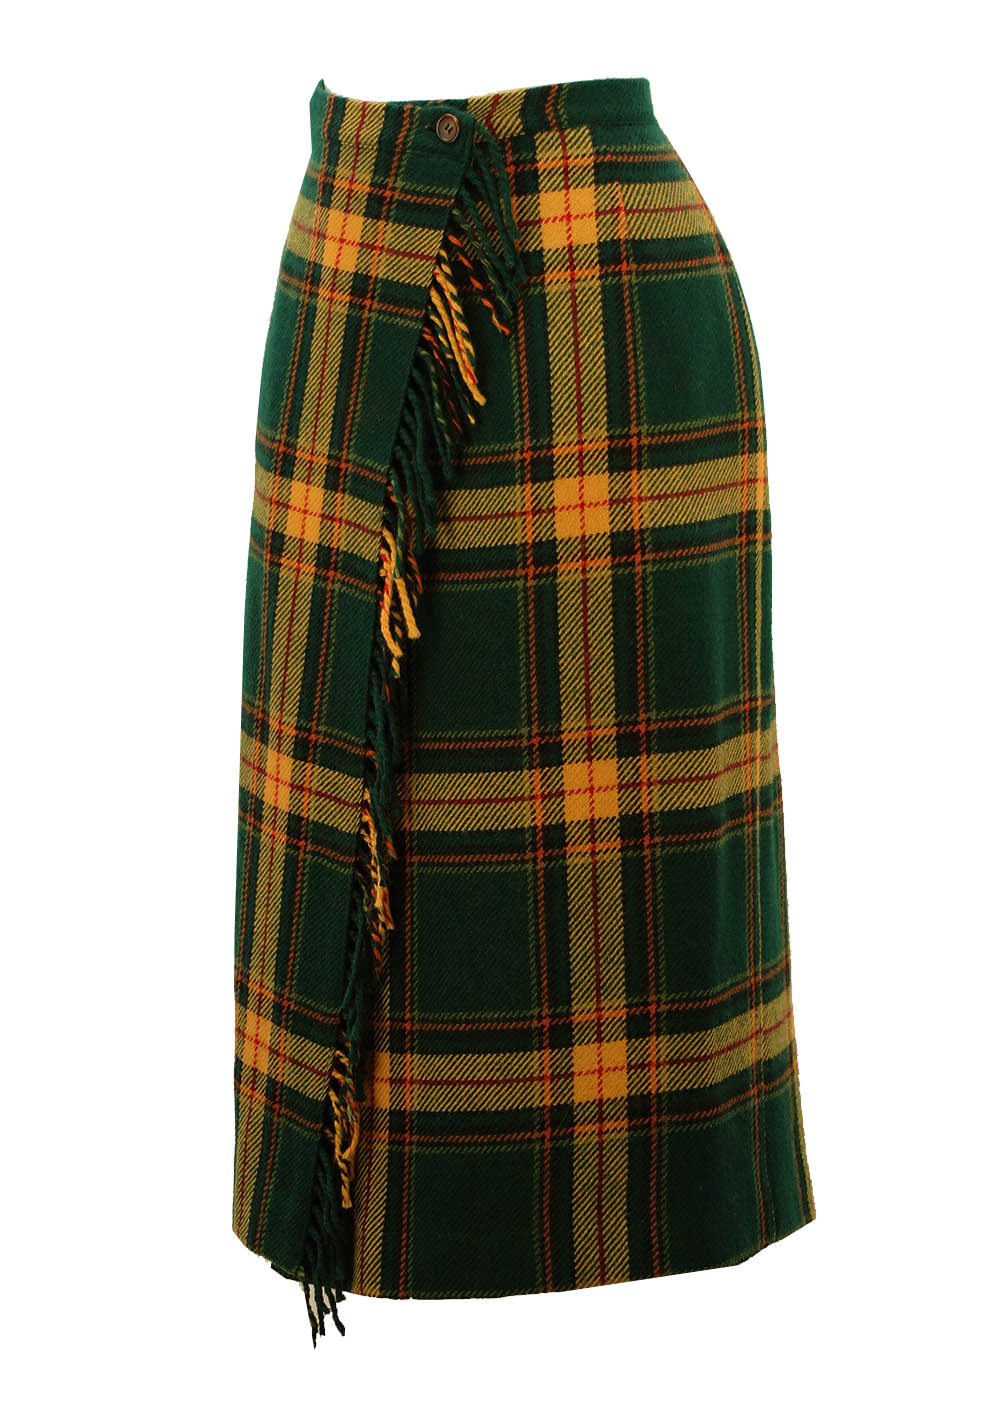 Pure Wool Green Amp Yellow Tartan Skirt M Reign Vintage